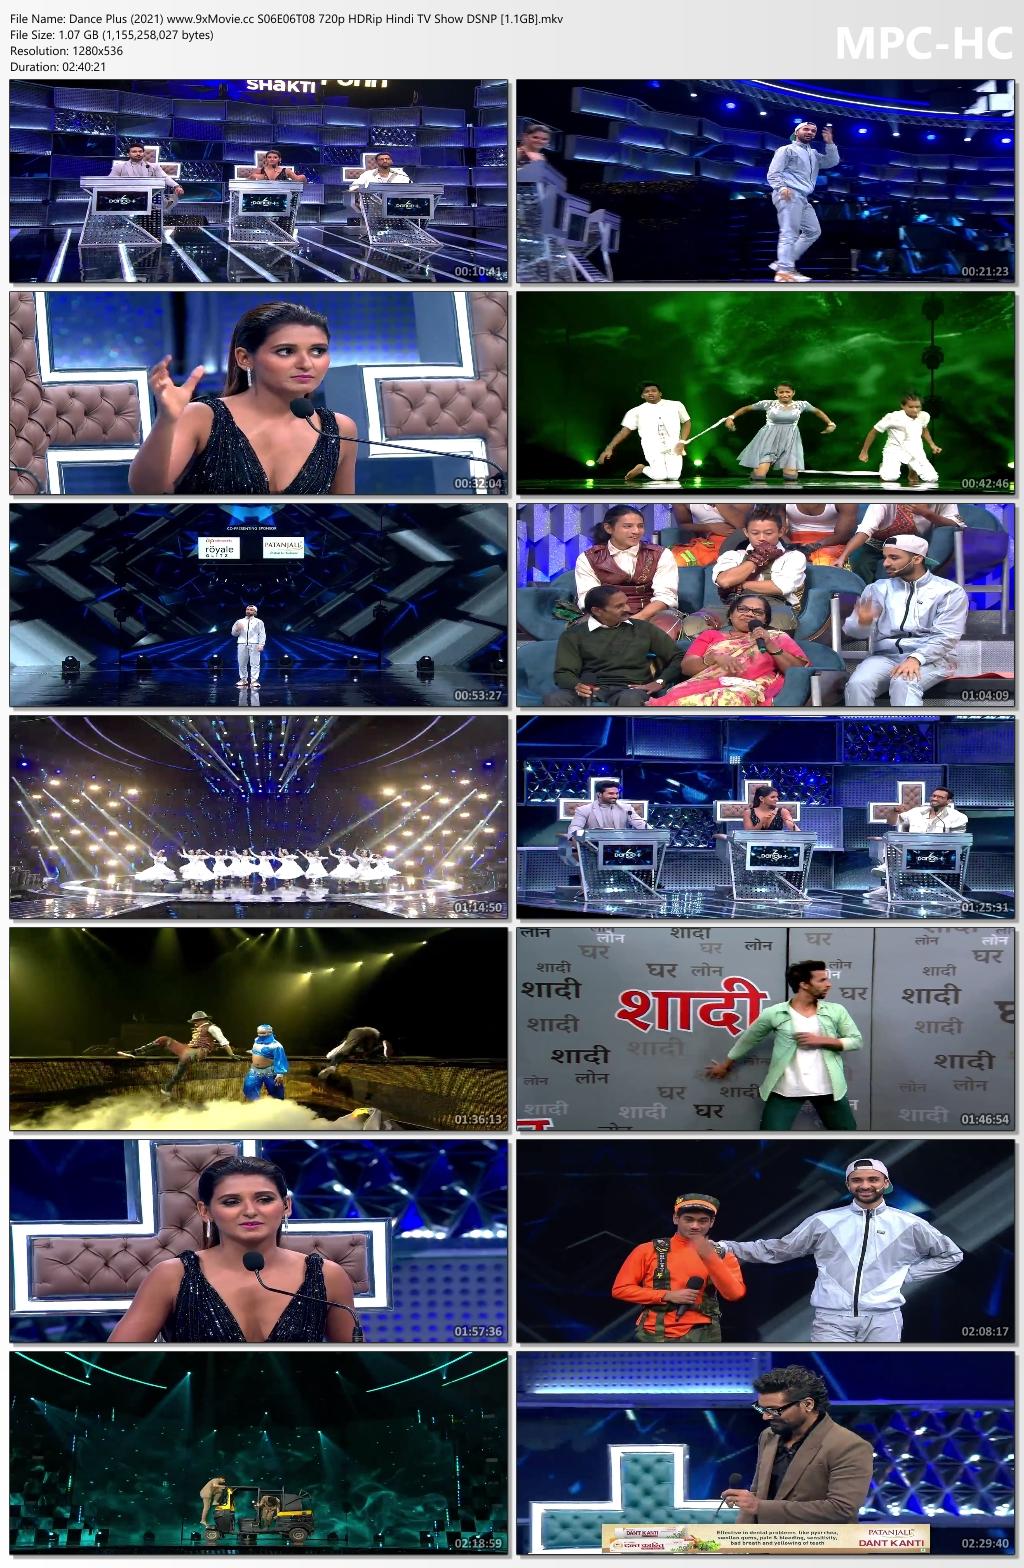 Dance-Plus-2021-www-9x-Movie-cc-S06-E06-T08-720p-HDRip-Hindi-TV-Show-DSNP-1-1-GB-mkv